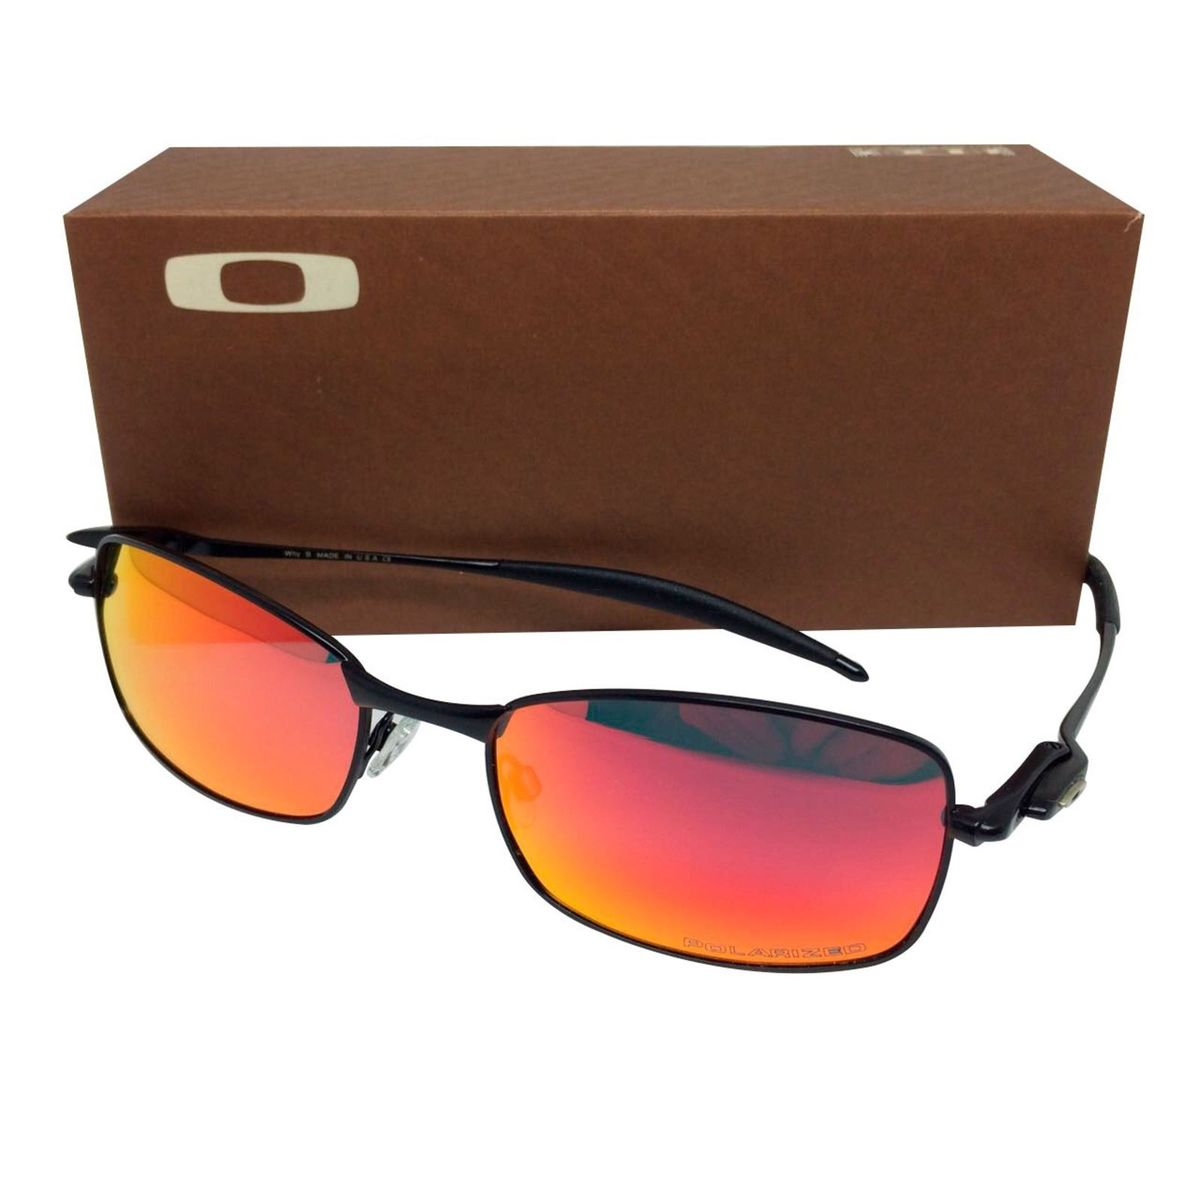 71d68dd18e3ca Oculos Oakley Square Whisker Varias Cores   Óculos Masculino Oakley ...